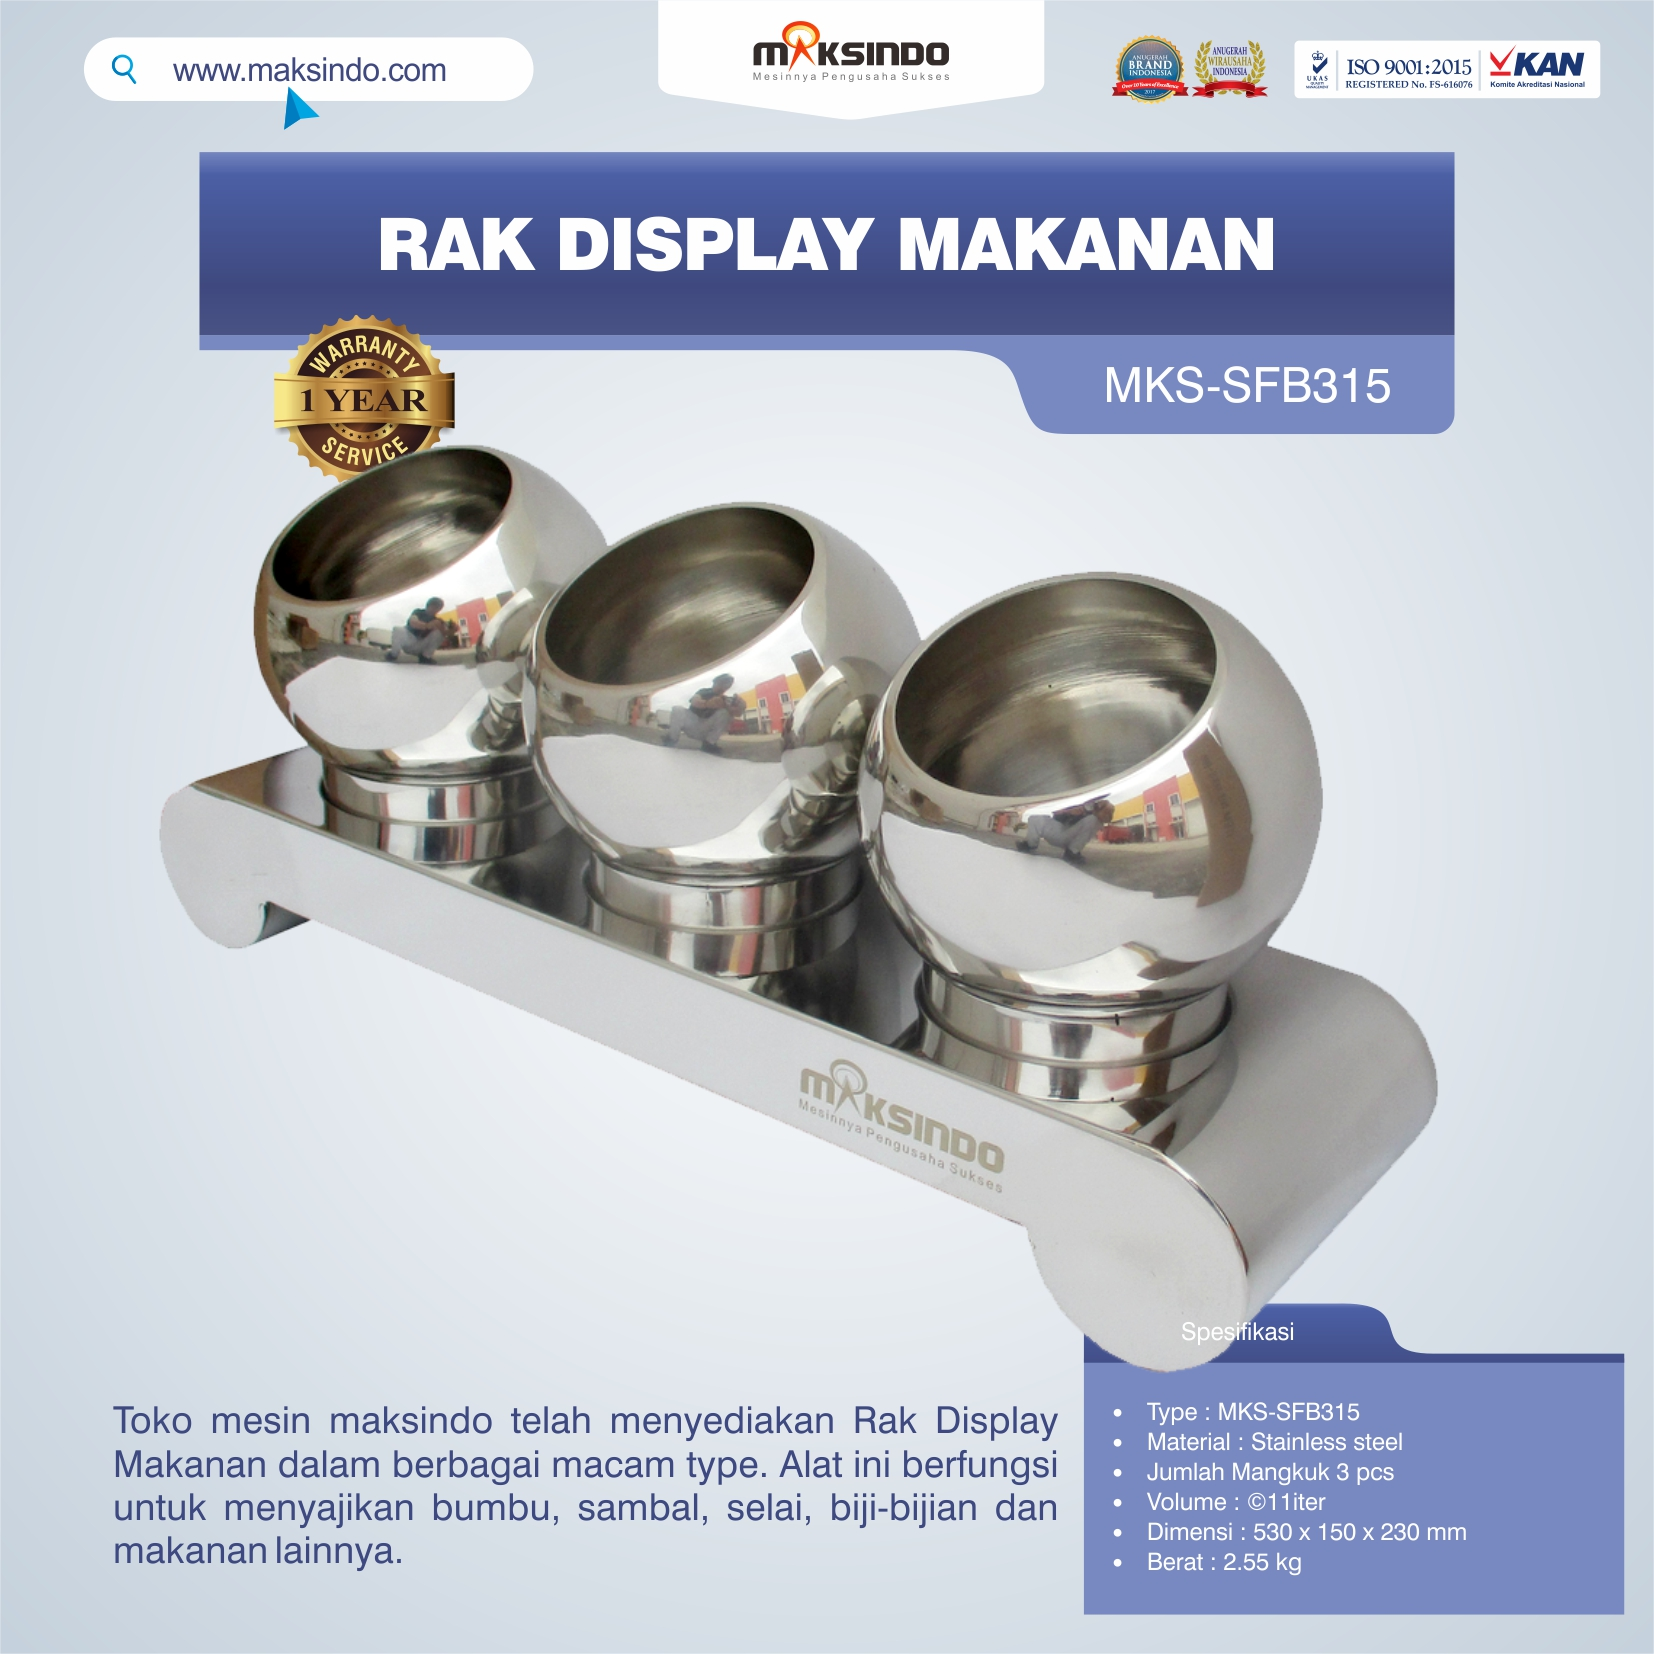 Jual Rak Display Makanan MKS-SFB315 di Mataram